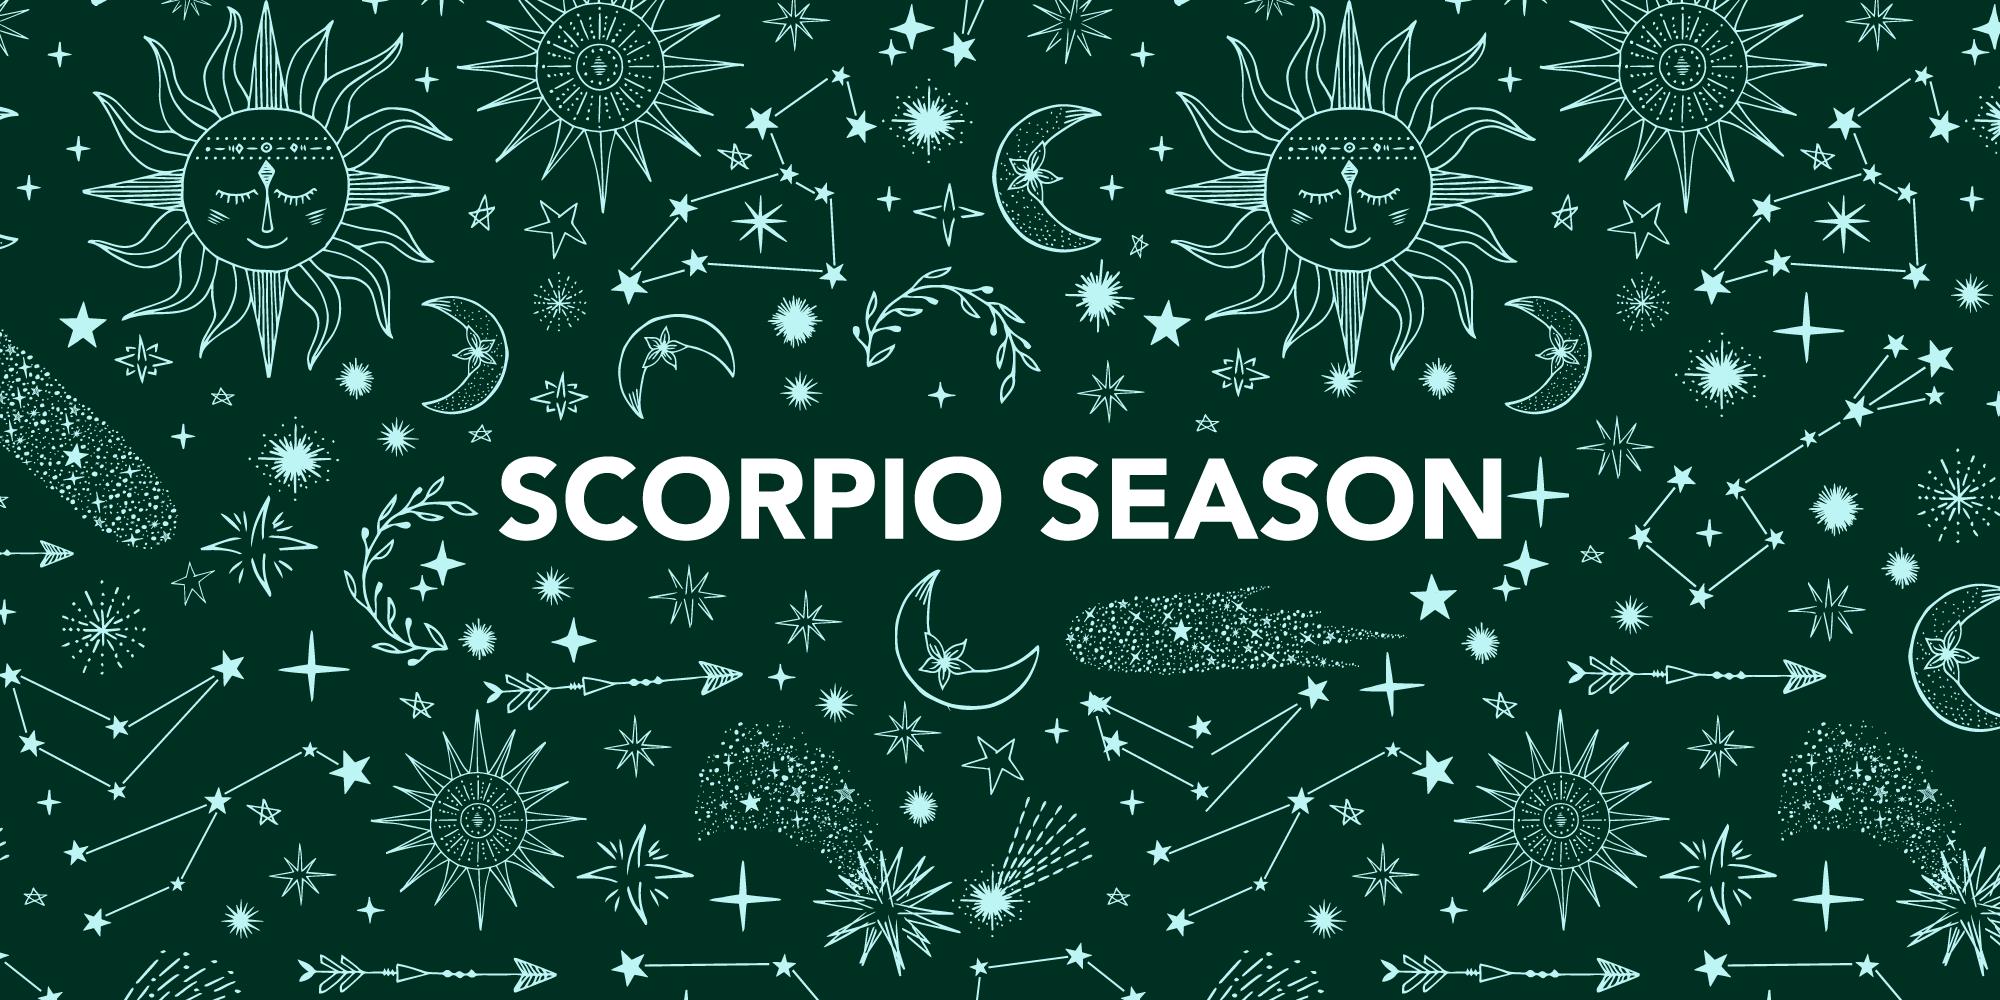 Months scorpio zodiac sign August 2021